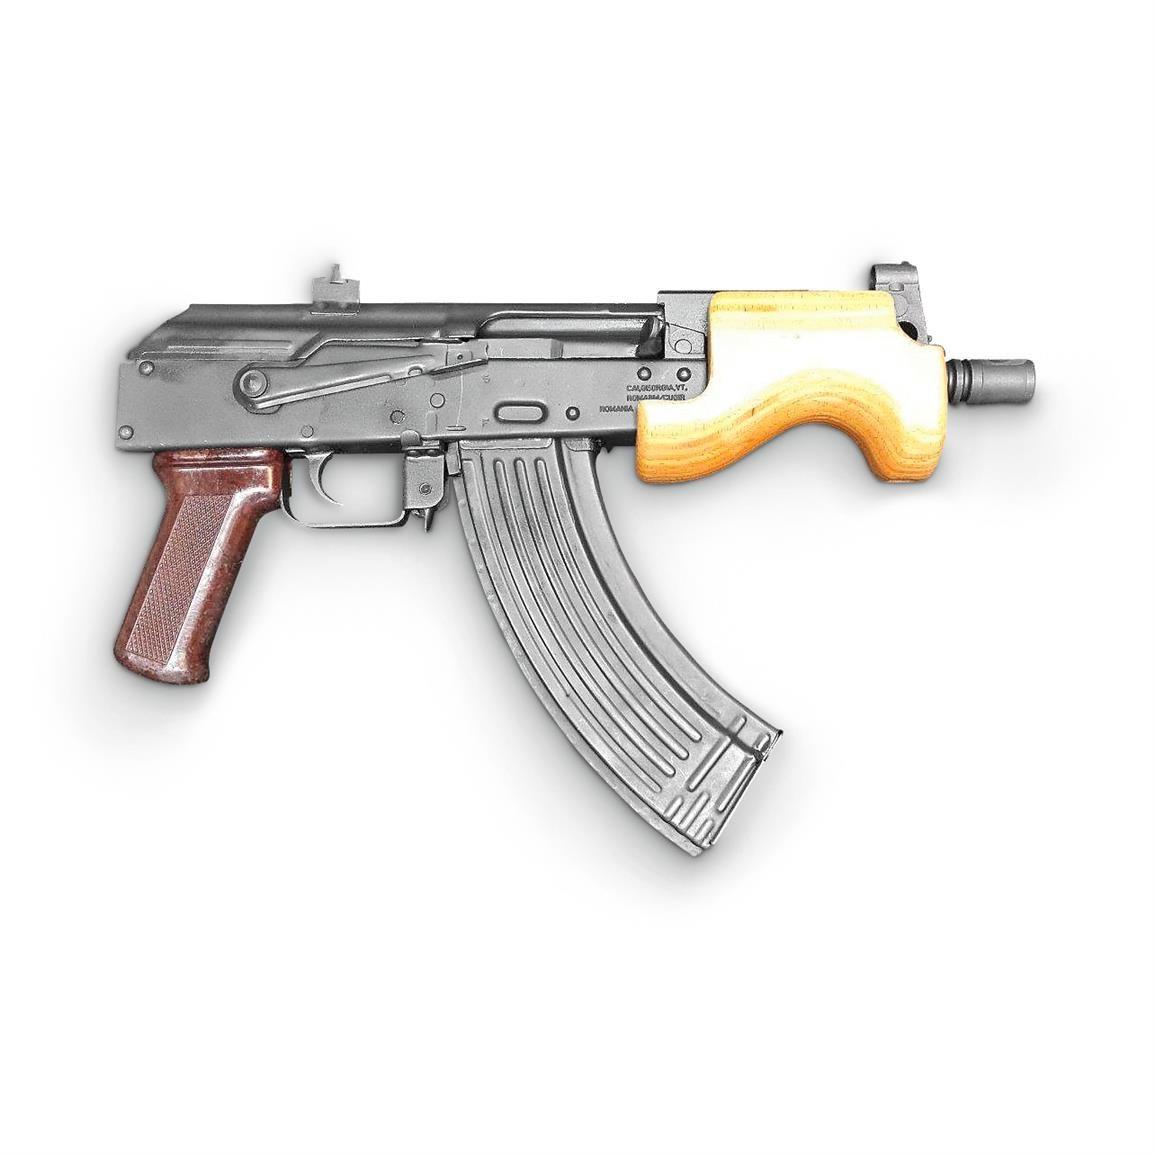 Family AK47 M16 SMG USA Shirt2nd Amendment American Guns Hoodie